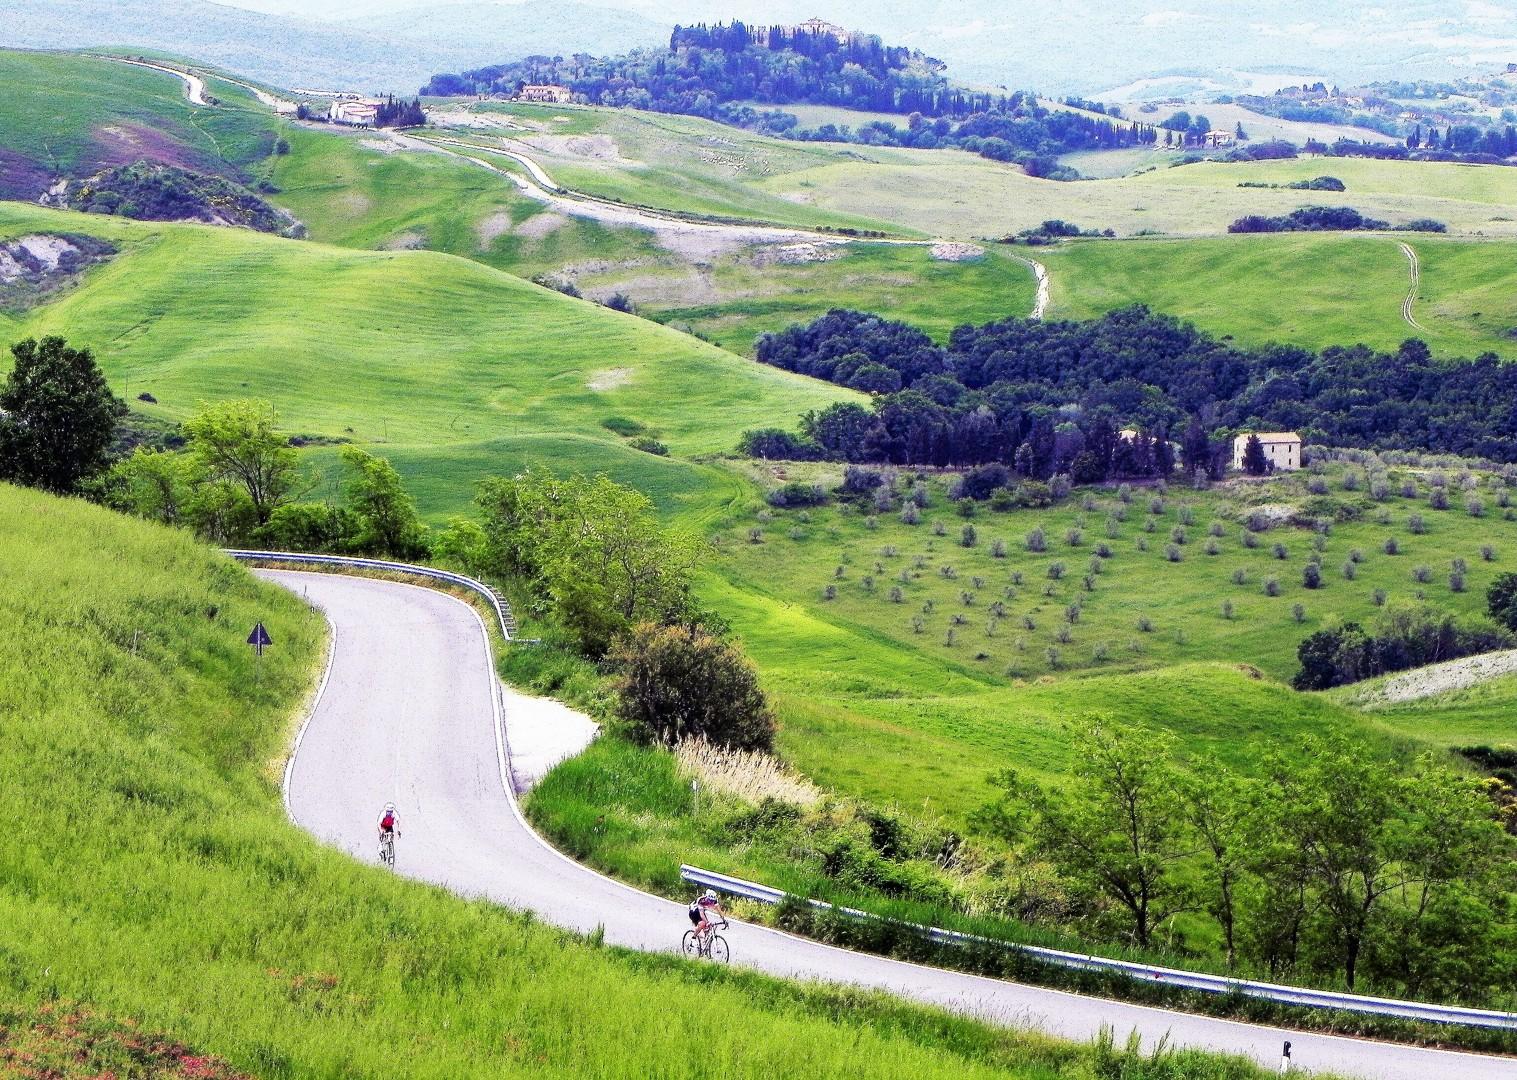 self-guided-cycling-holiday-italy-tuscany.jpg - Italy - Tuscany Tourer - Self Guided Road Cycling Holiday - Italia Road Cycling